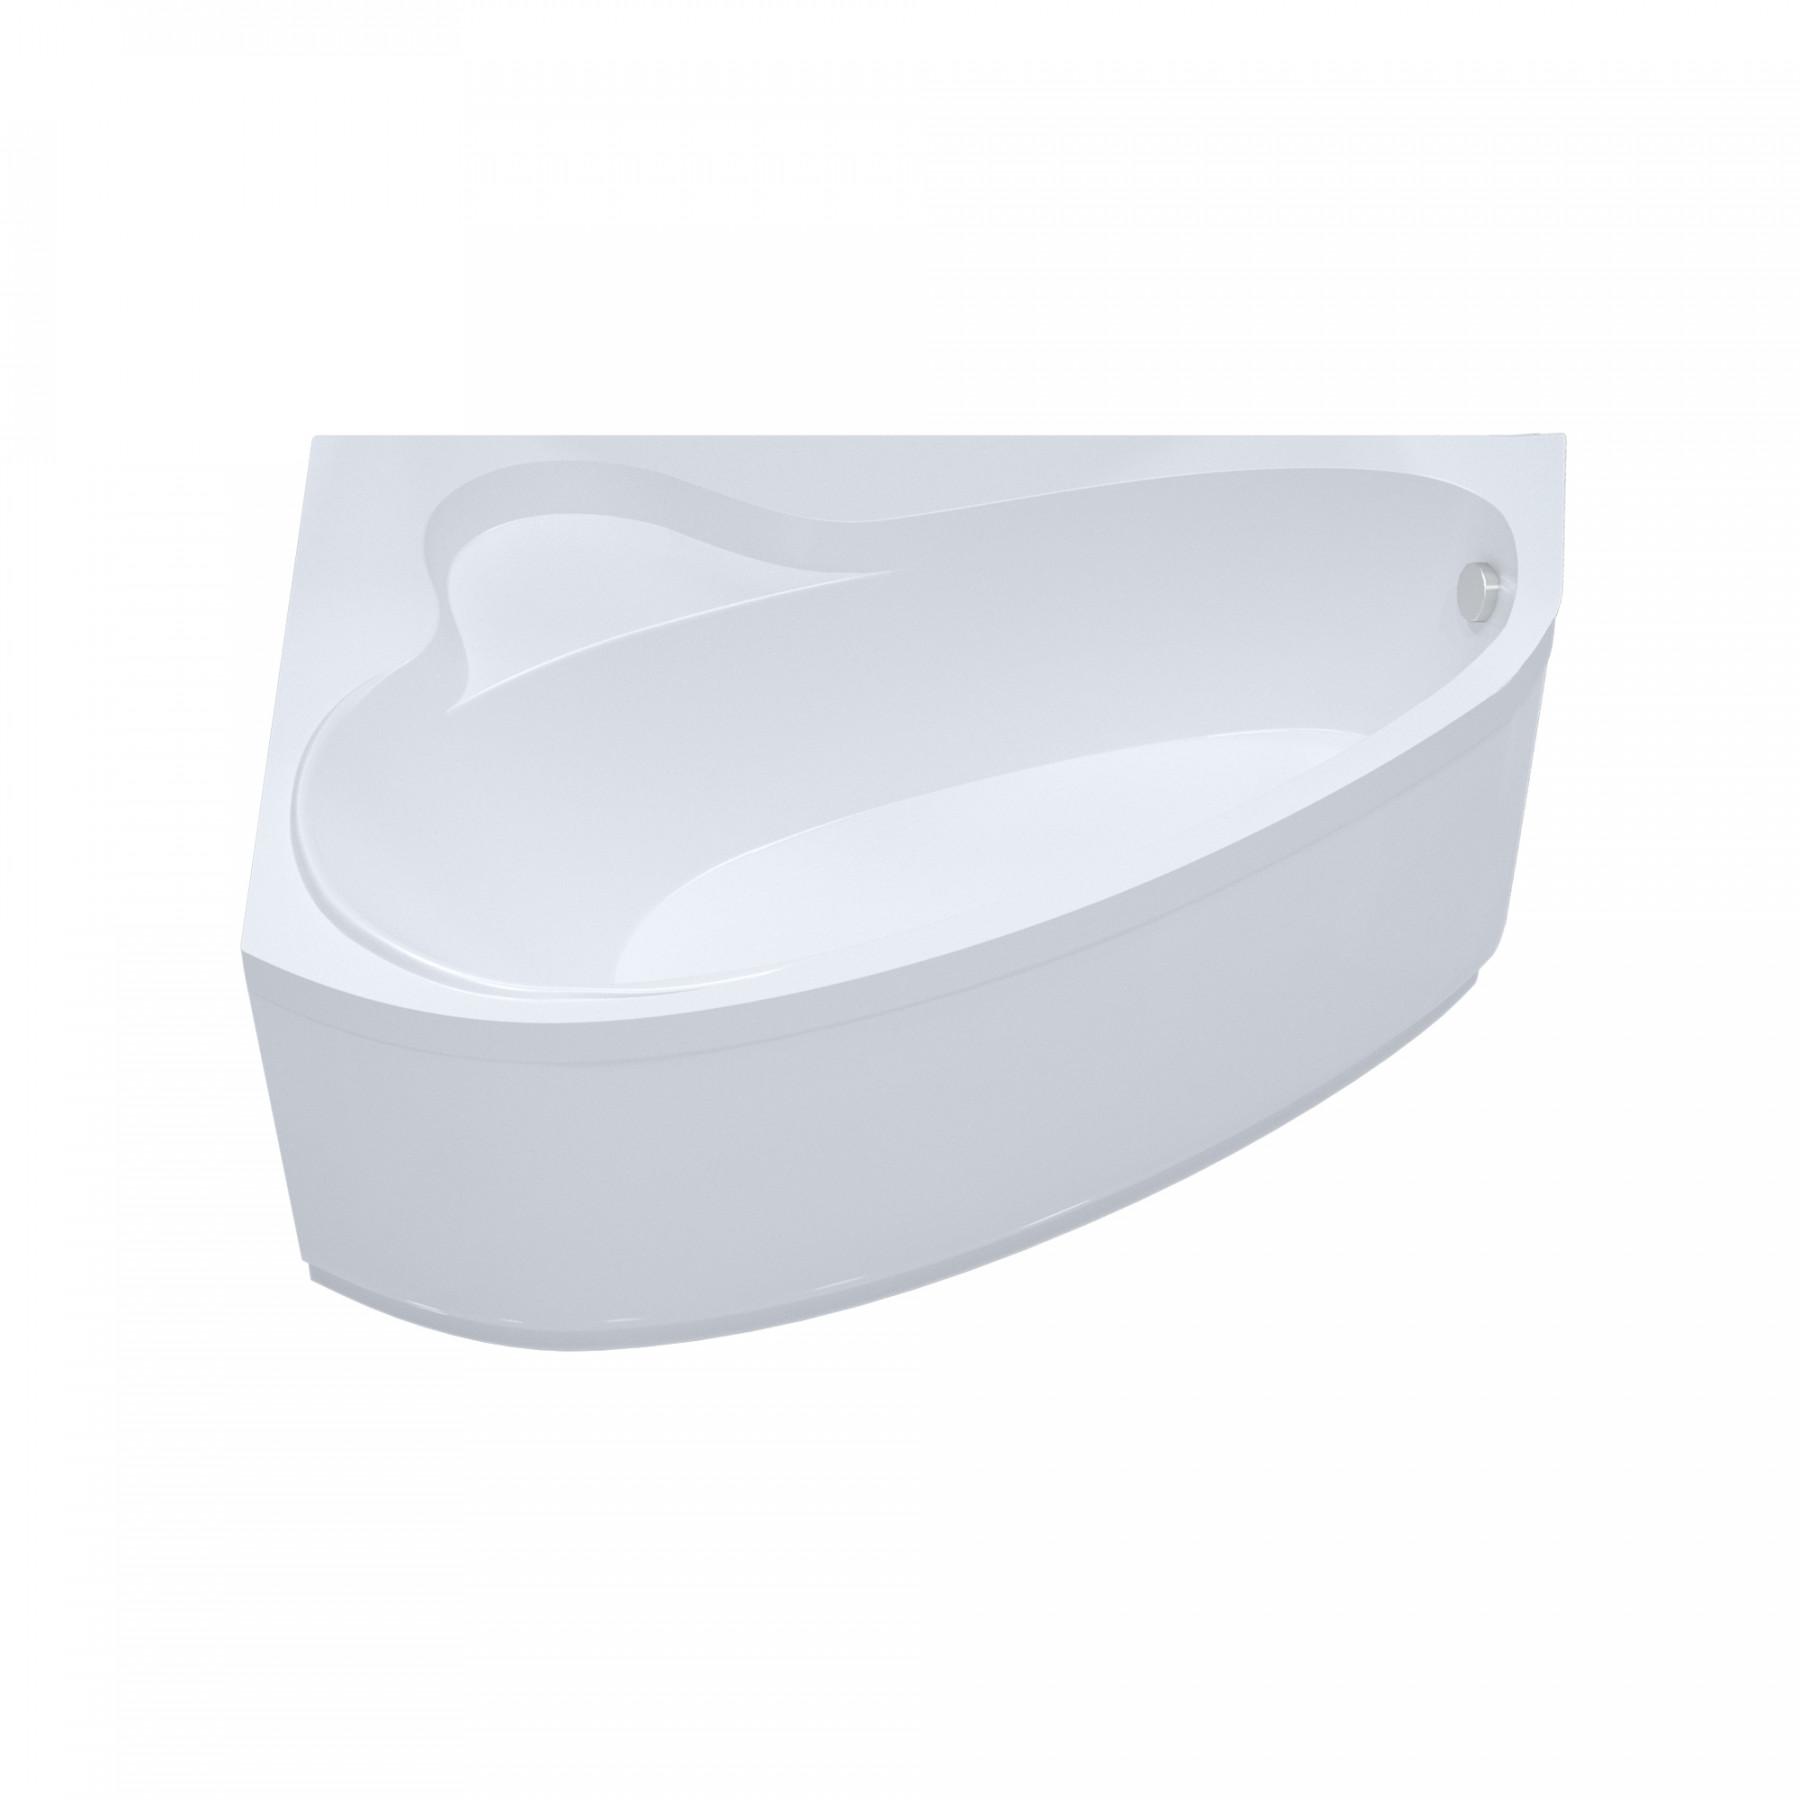 Акриловая ванна Triton Пеарл-шелл 160x104 правая